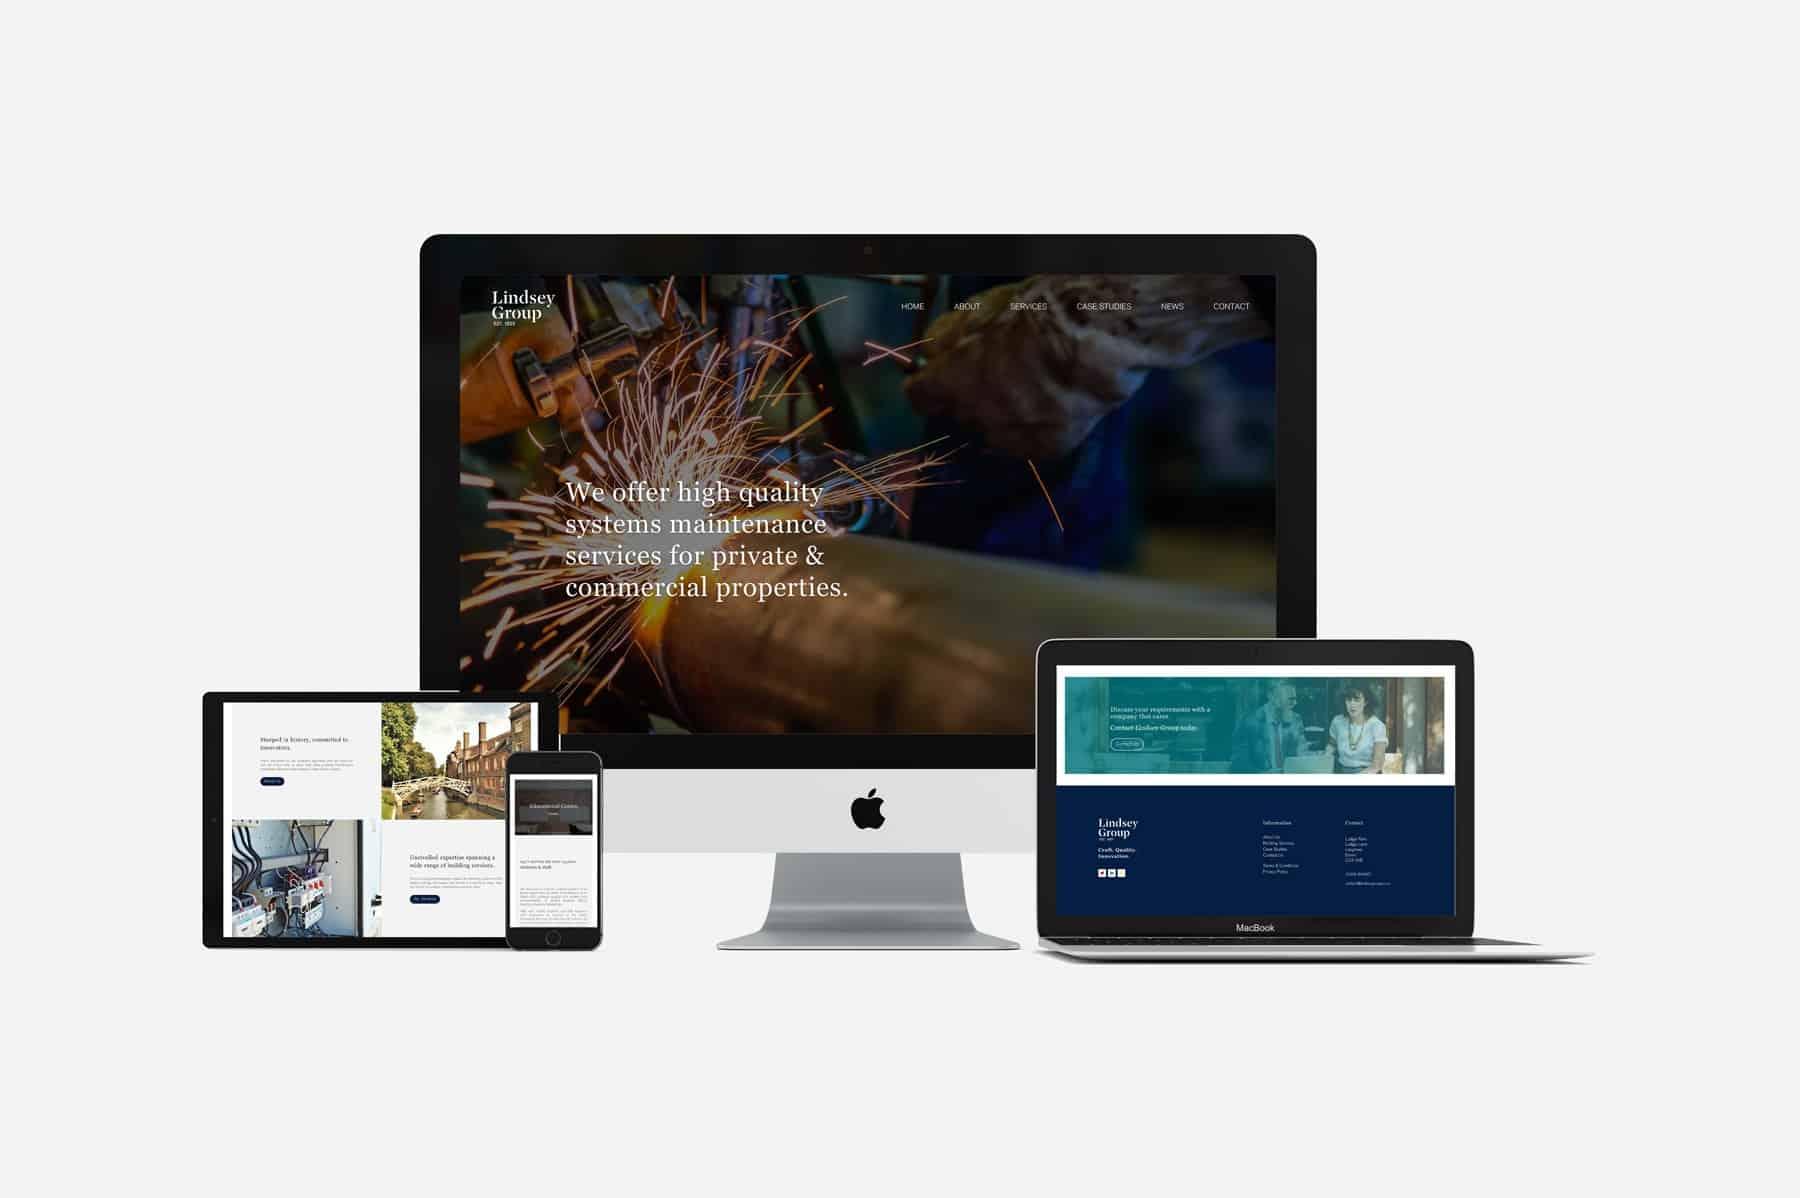 multi device display lindsey group responsive web design